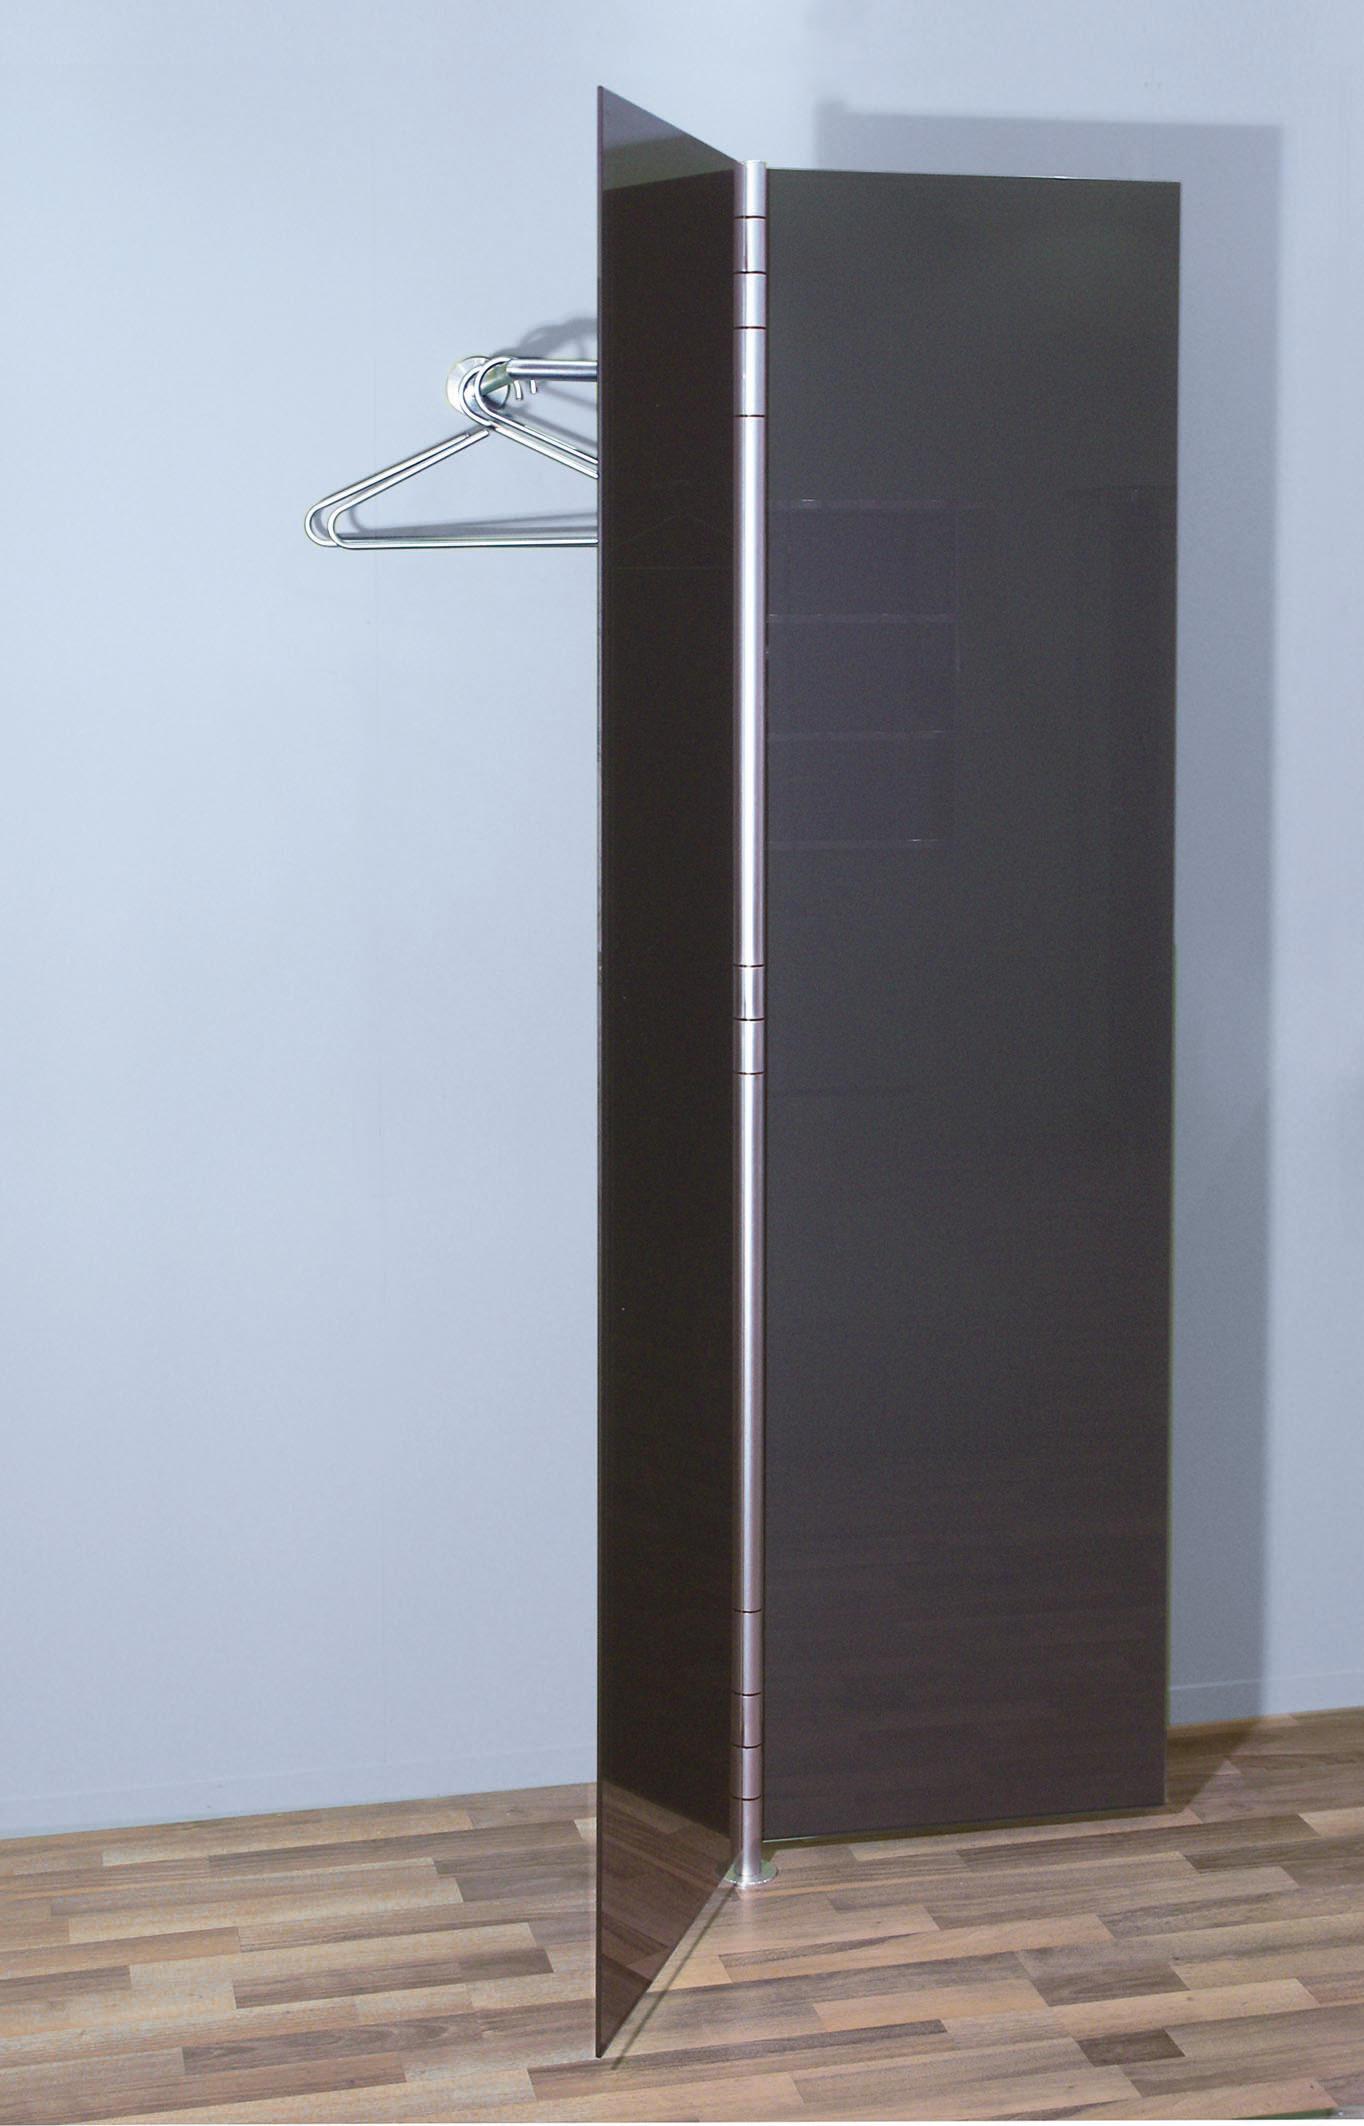 albatros 1 stender guardaroba d tec architonic. Black Bedroom Furniture Sets. Home Design Ideas